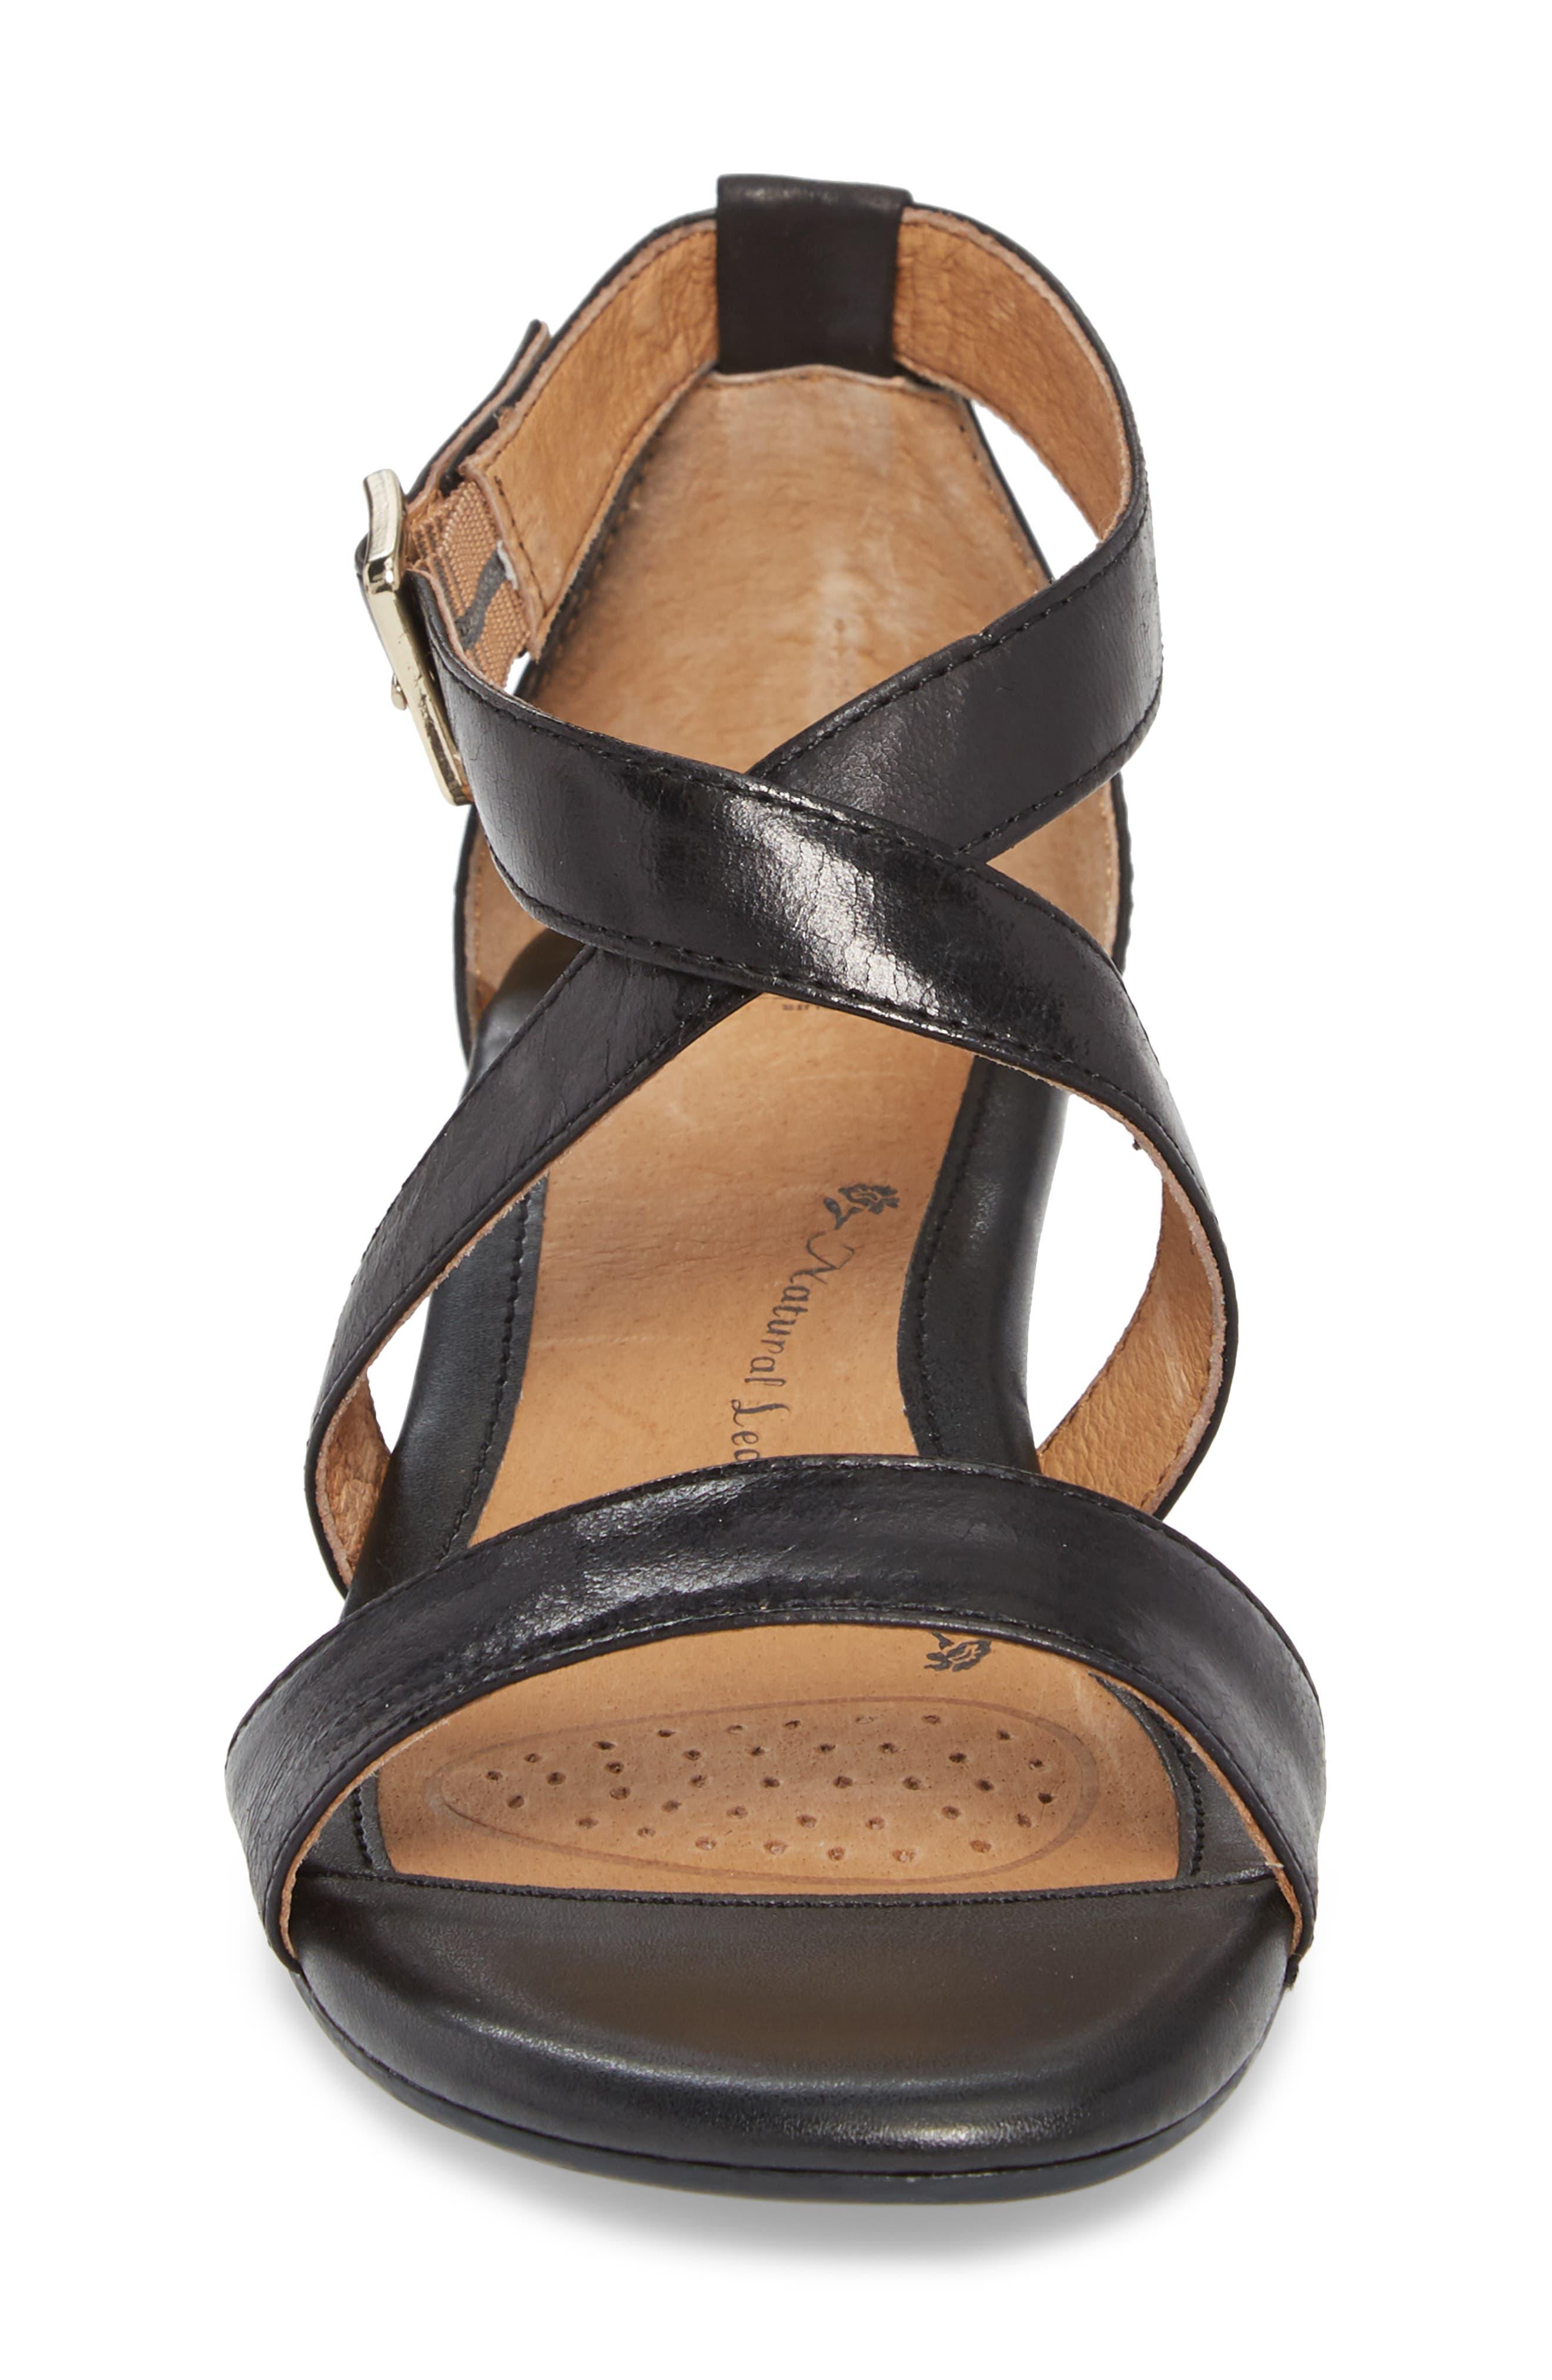 'Innis' Low Wedge Sandal,                             Alternate thumbnail 4, color,                             Black Leather